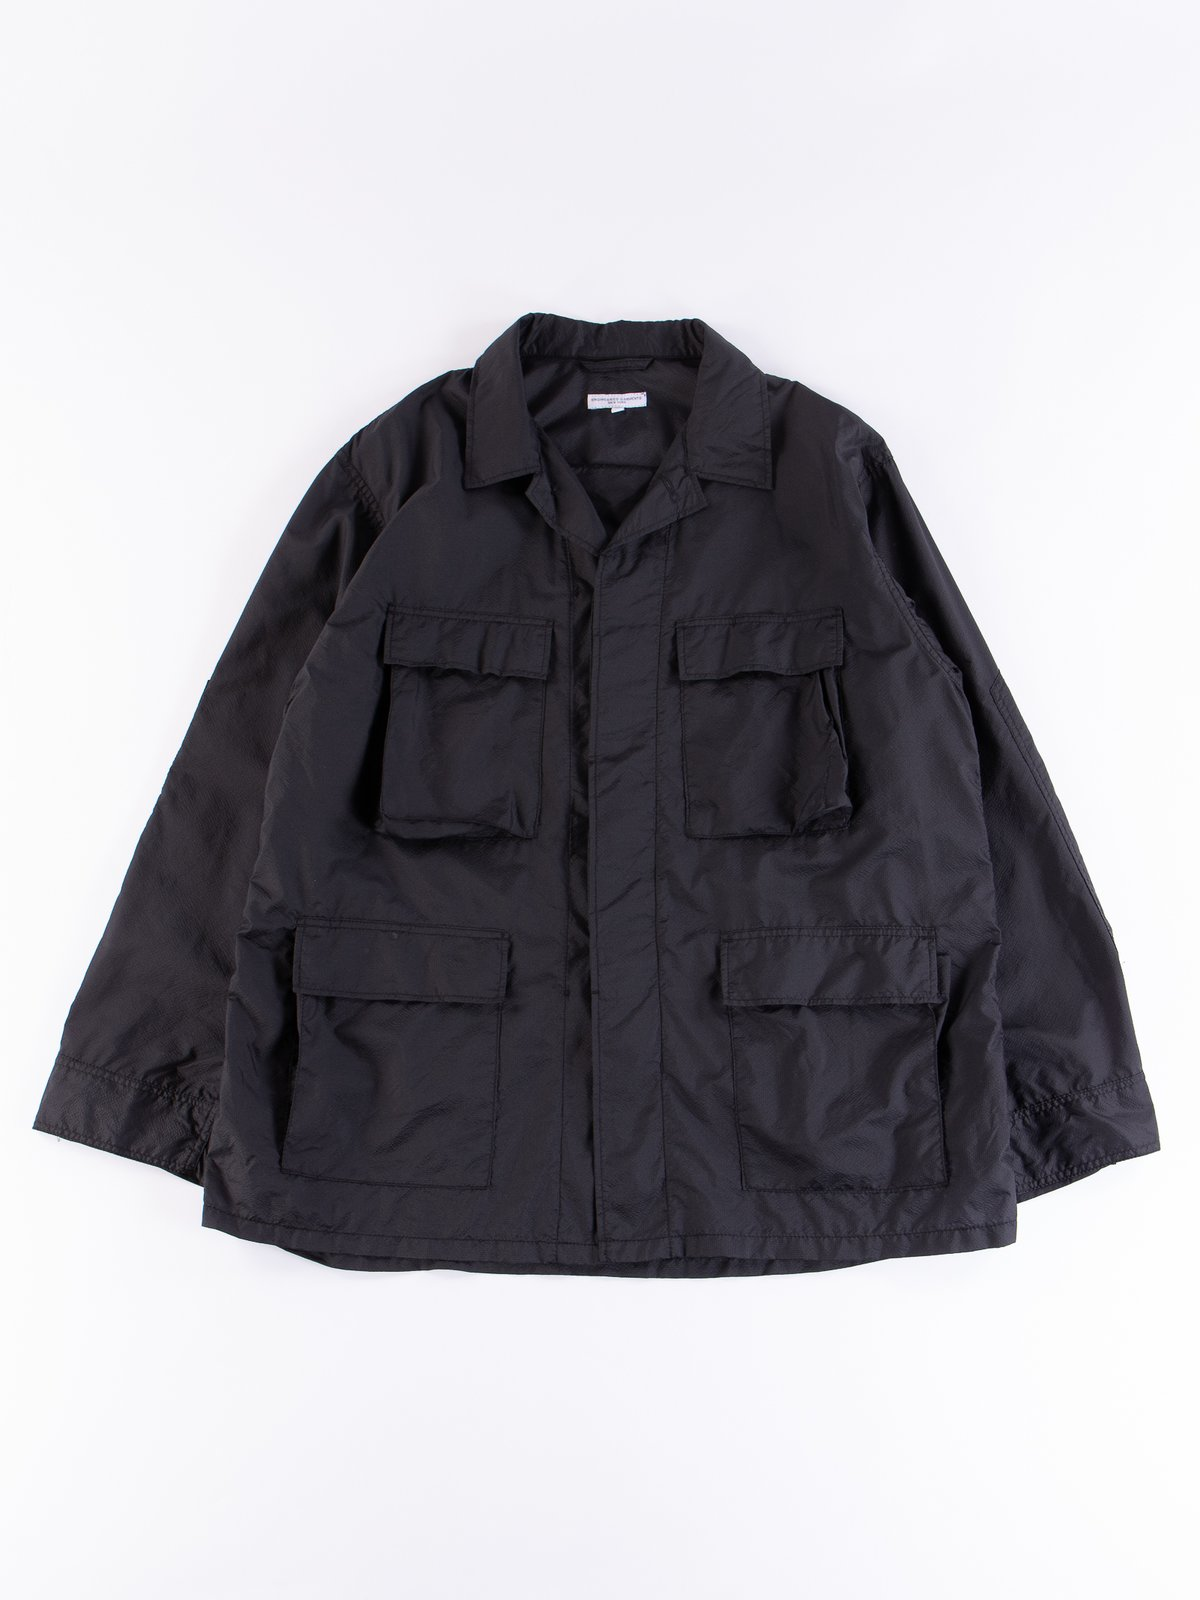 Black Nylon Micro Ripstop BDU Jacket - Image 1